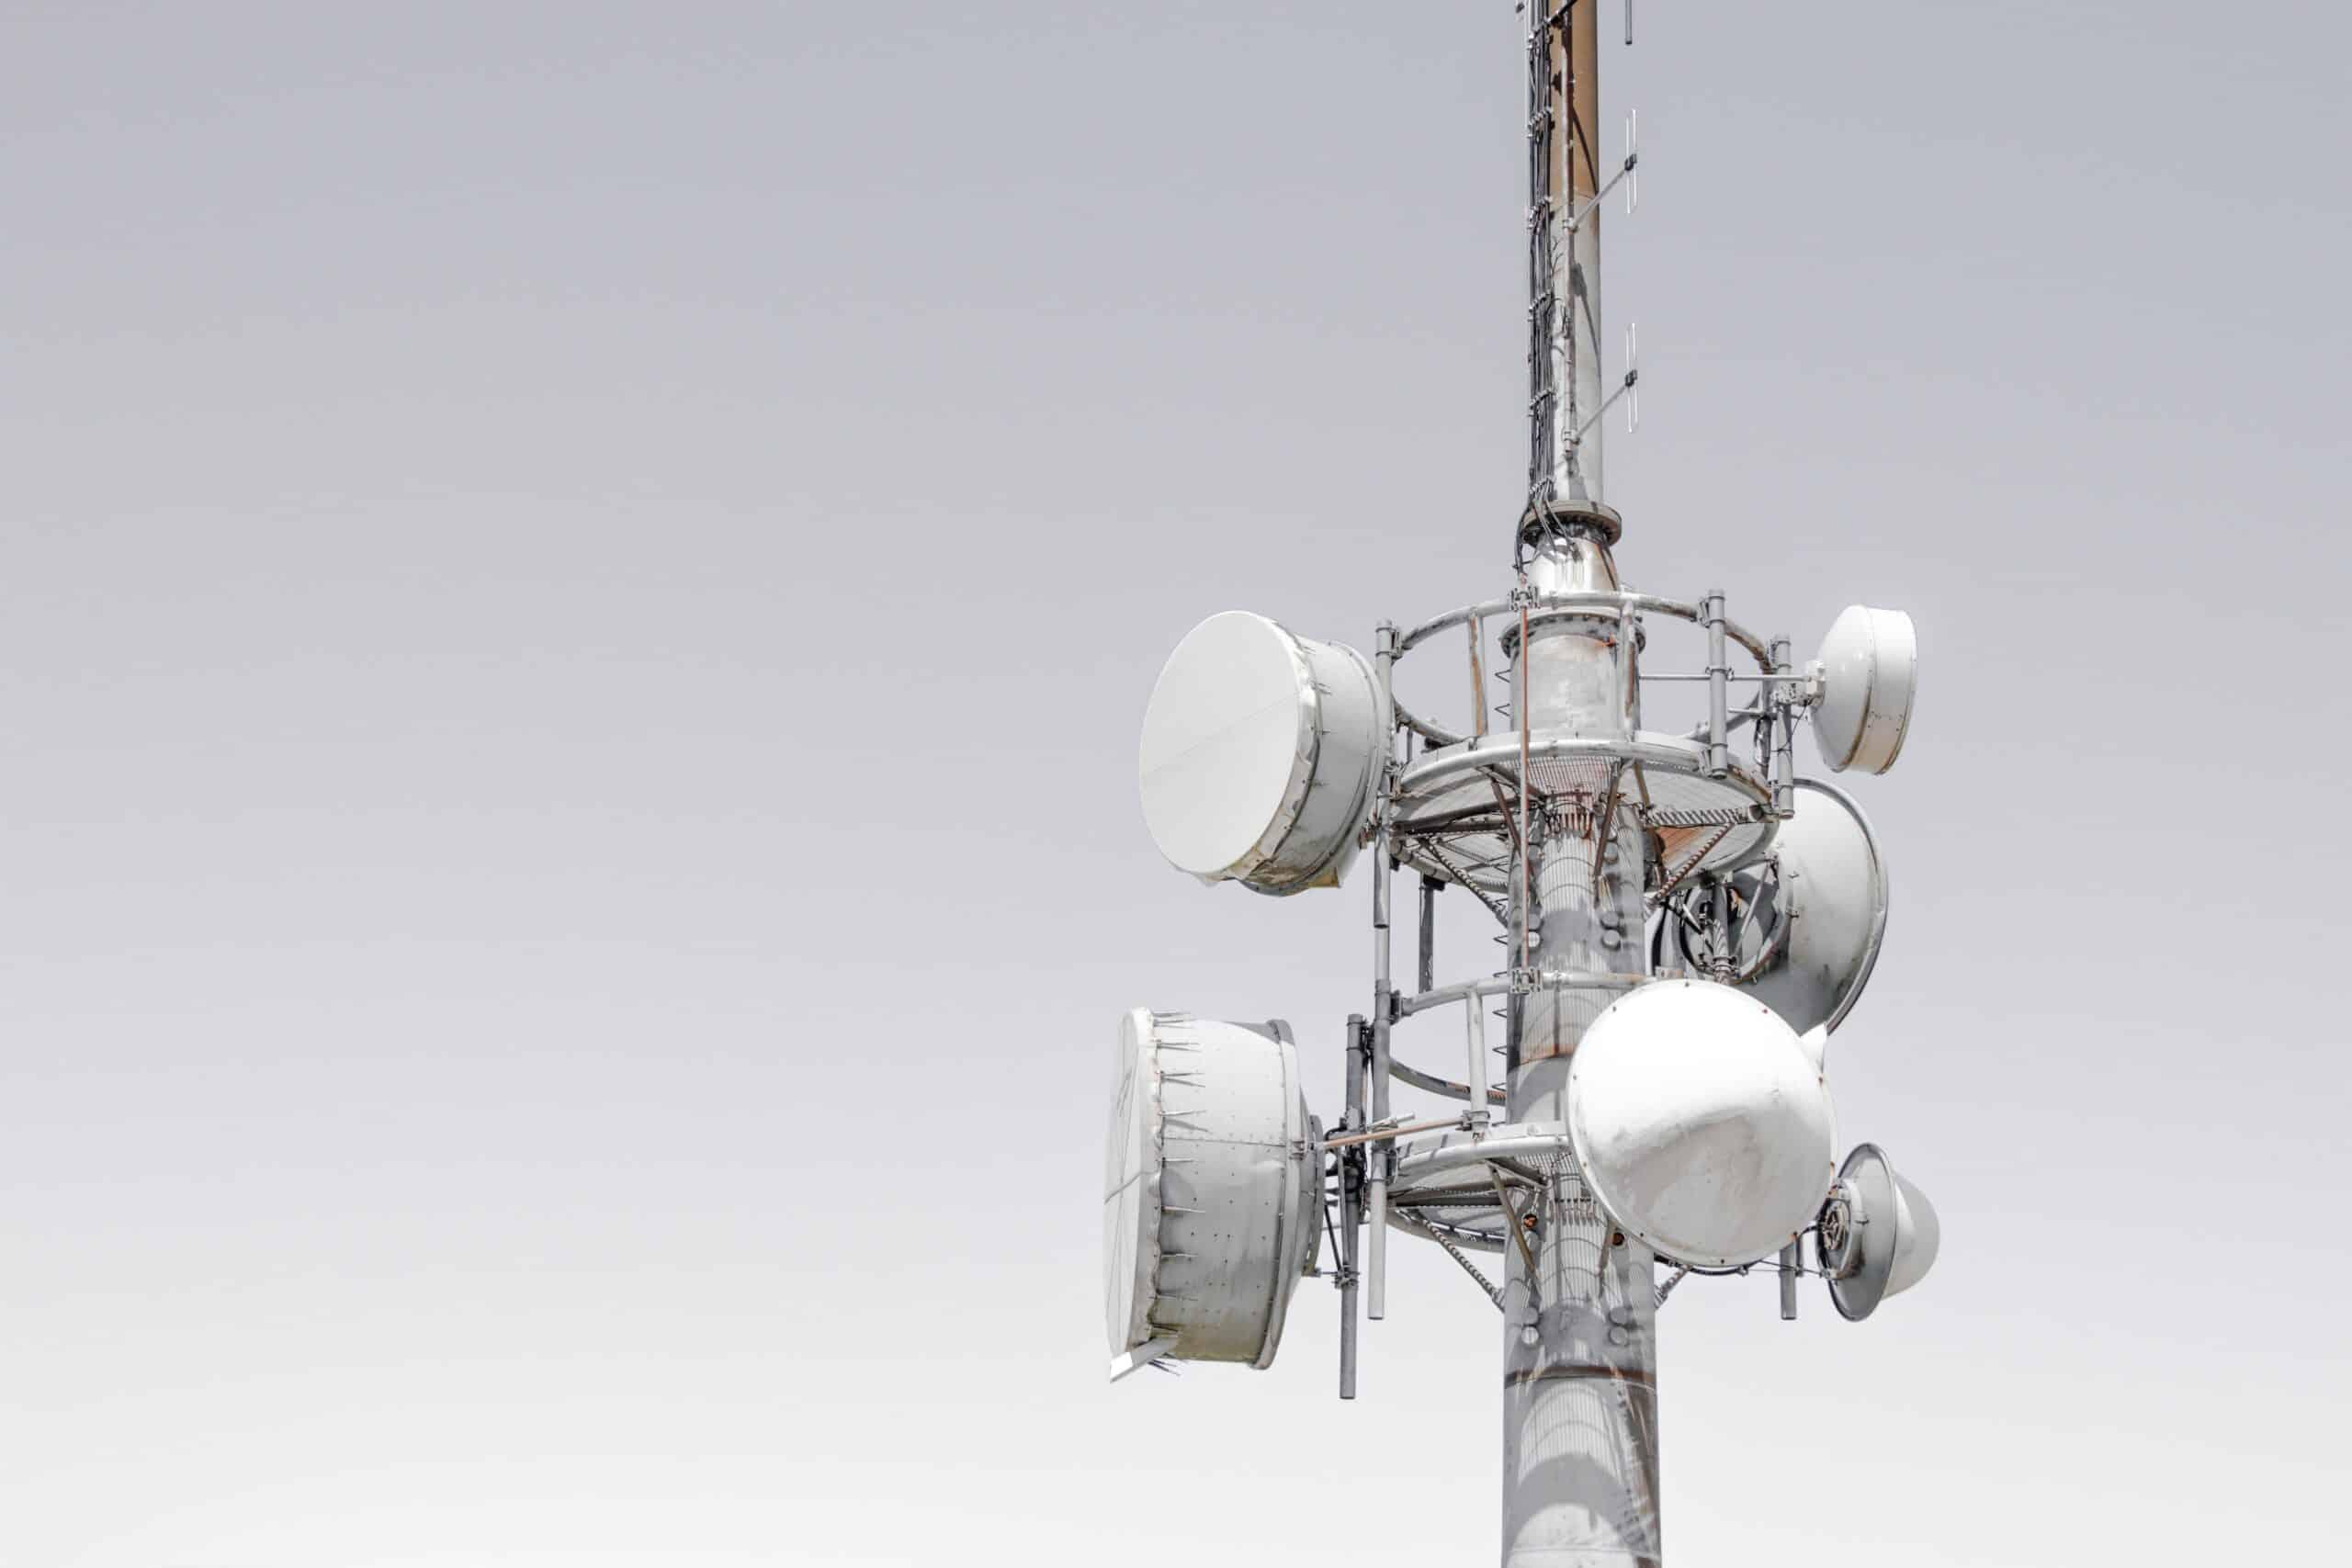 Maszt telekomunikacyjny 5G